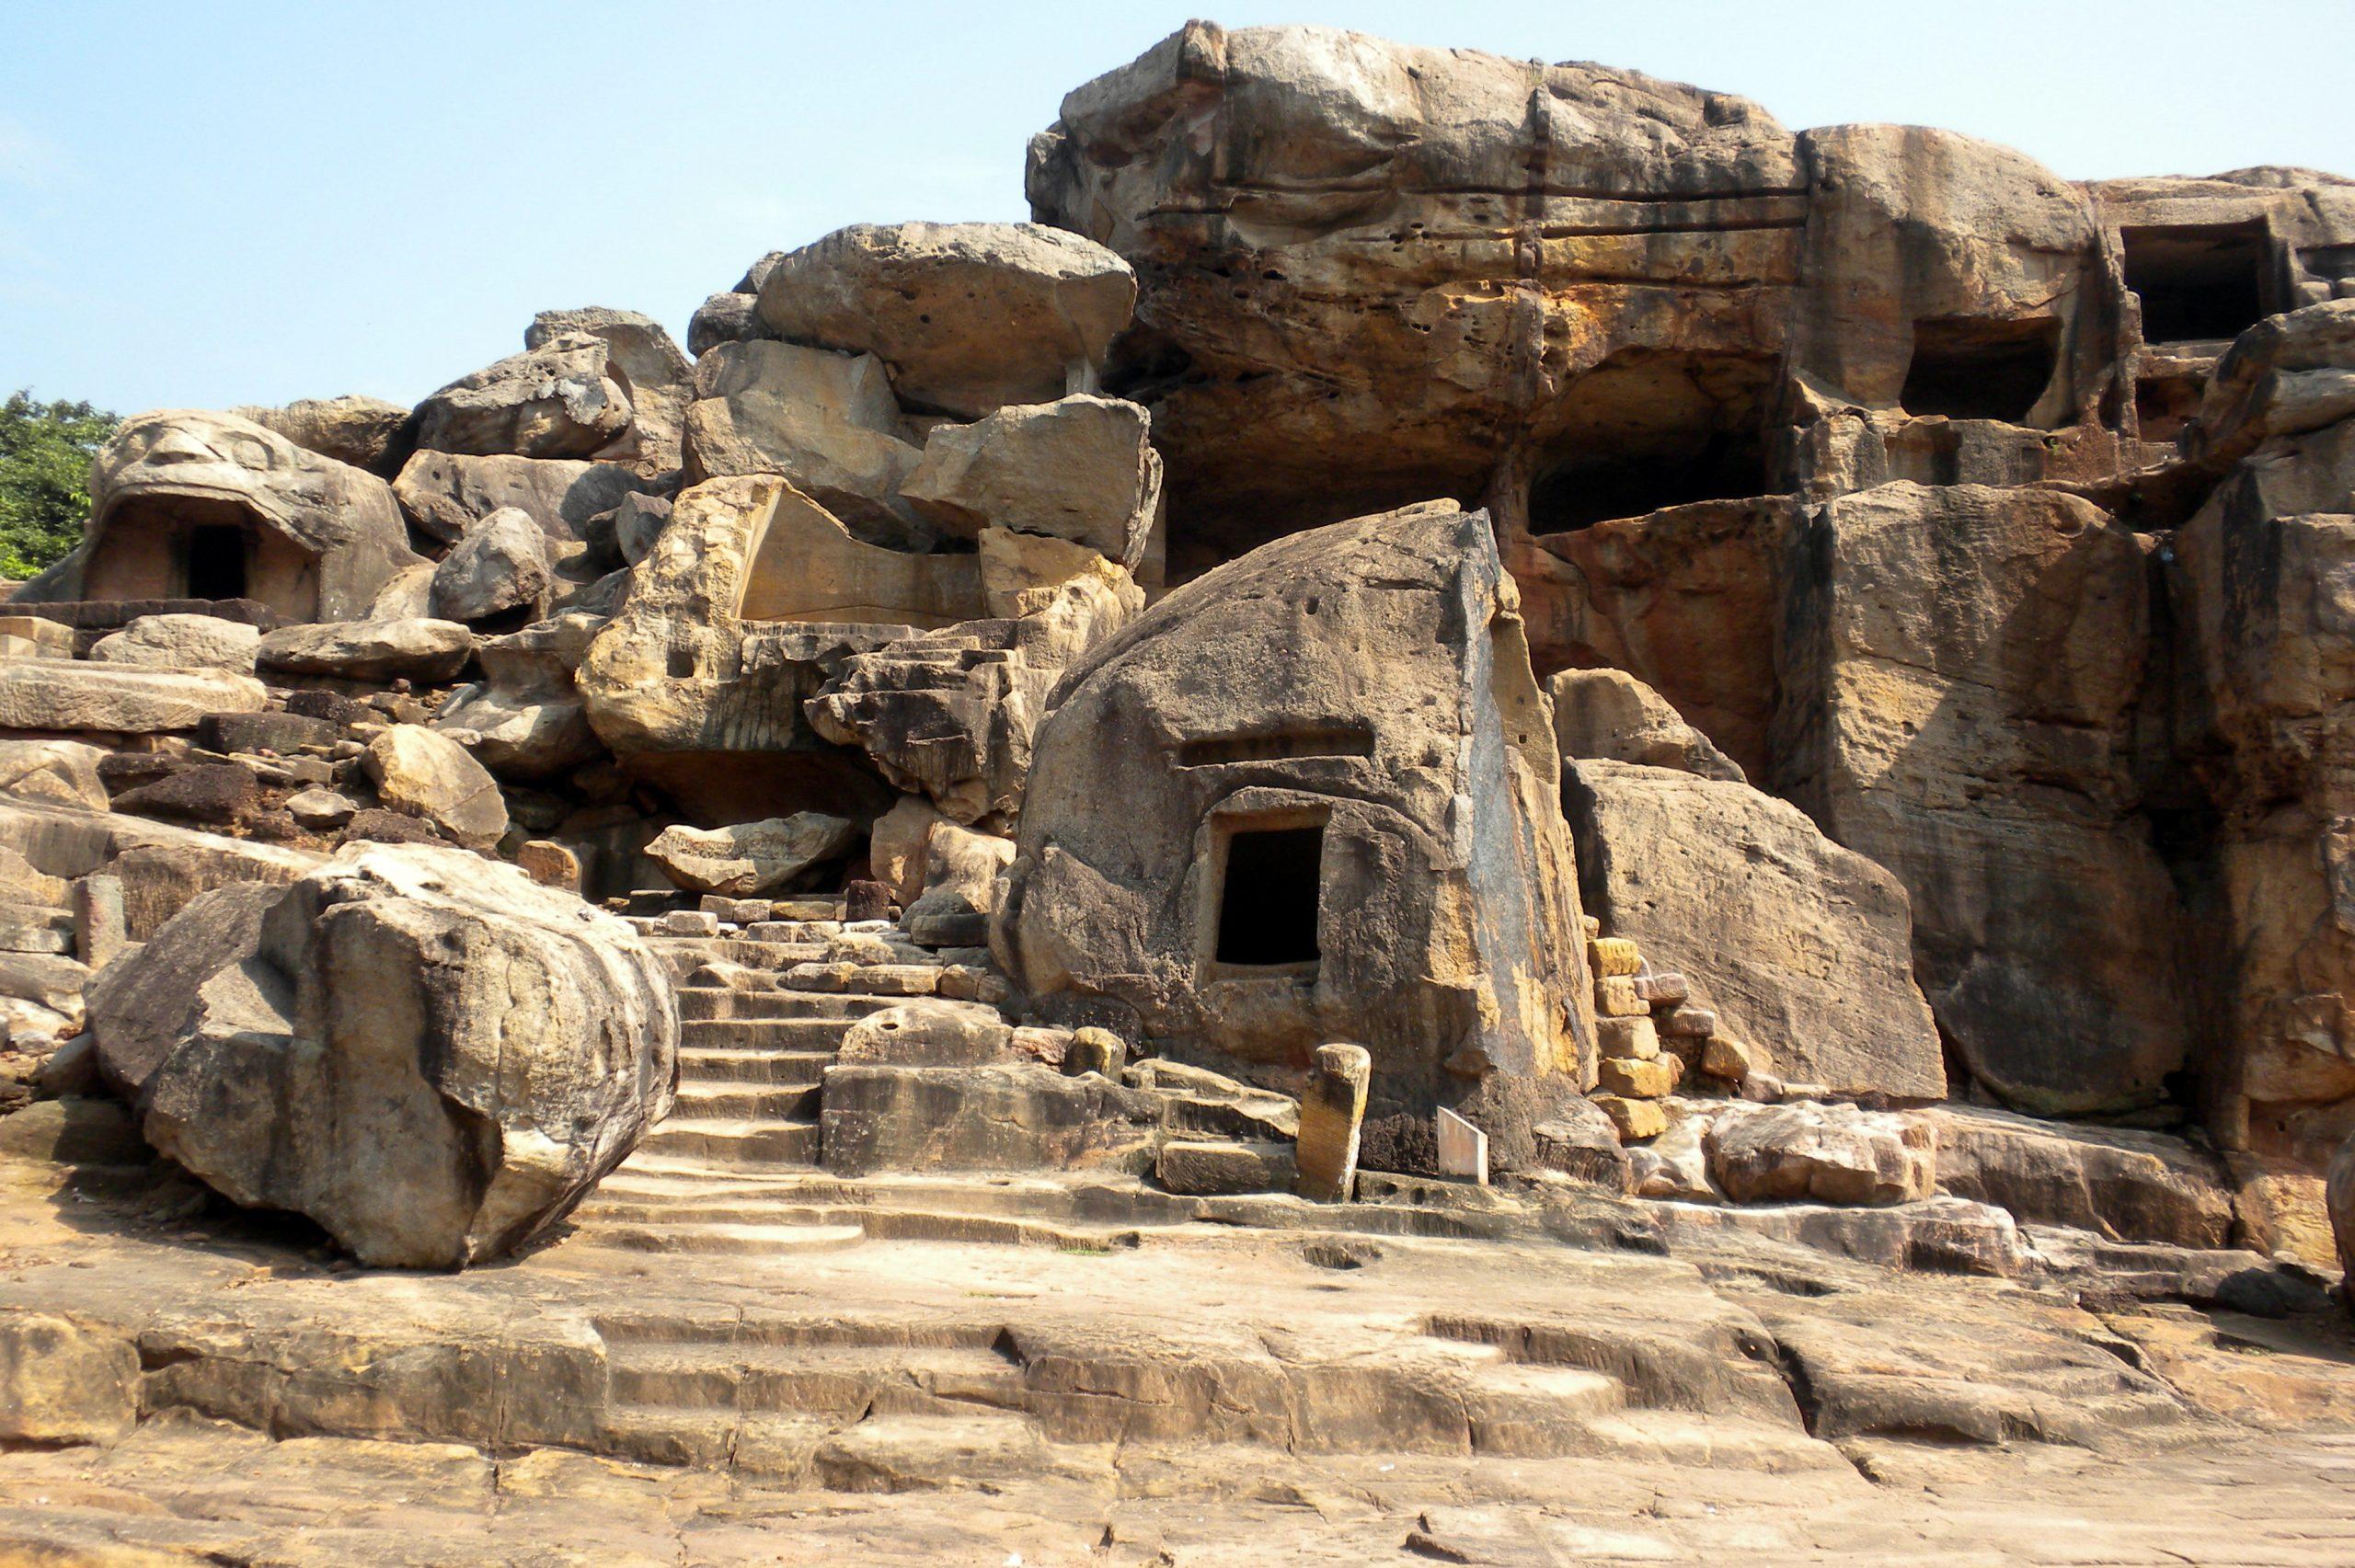 Khandagiri And Udaygiri Caves - Most Popular Place To Visit In Bhubaneswar